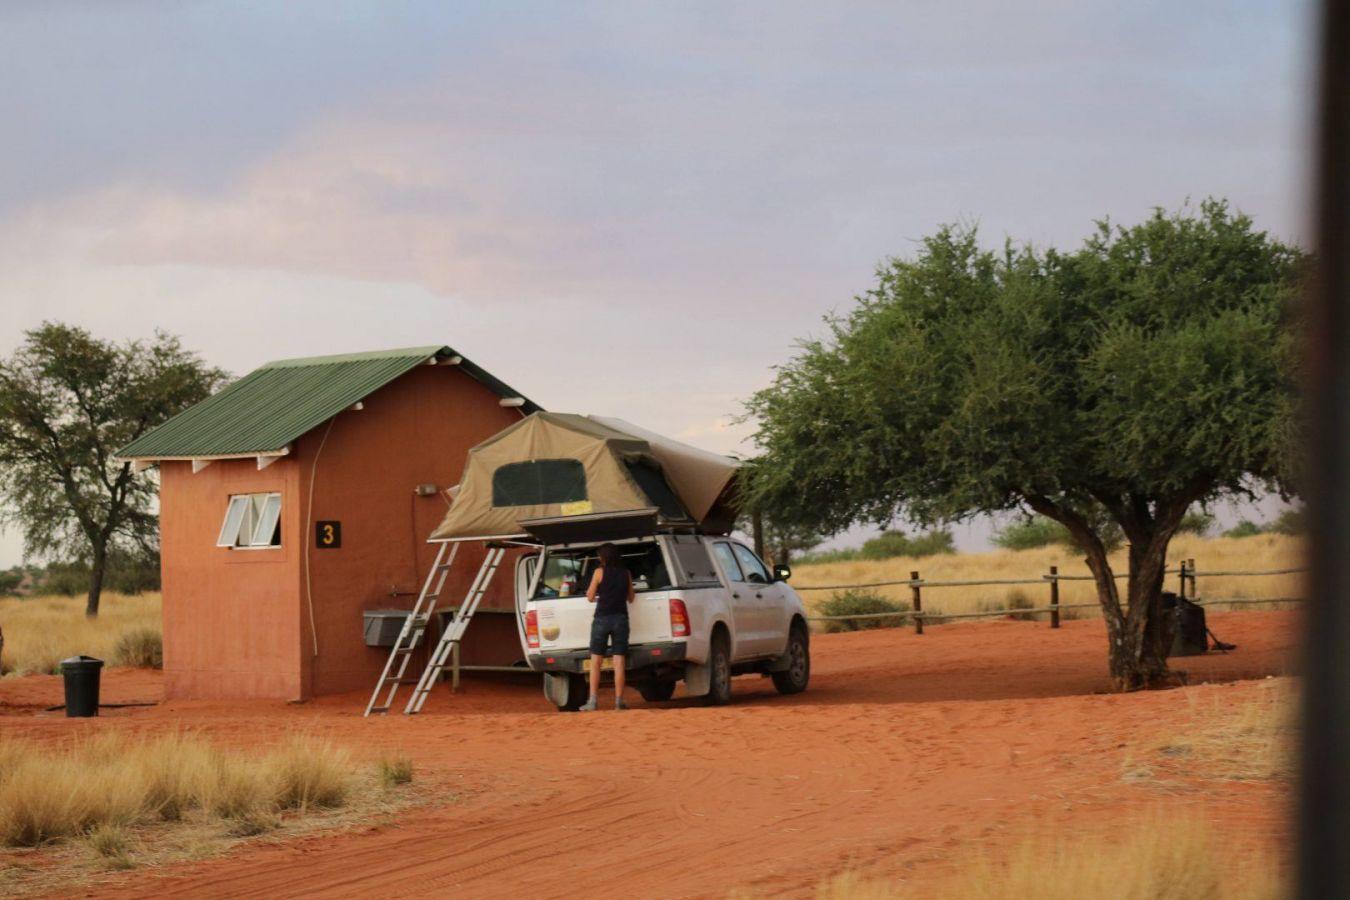 Daktent bij Bagatelle game ranch